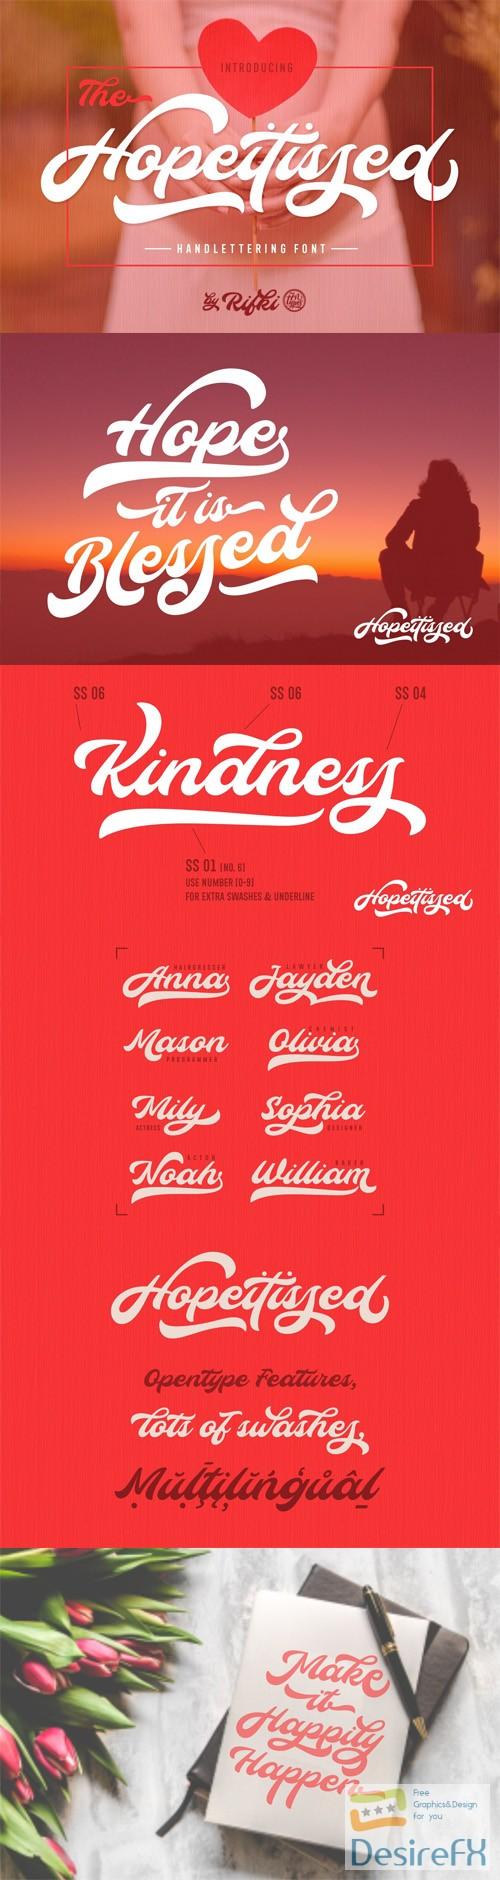 fonts - Hopeitissed Handlettering Font